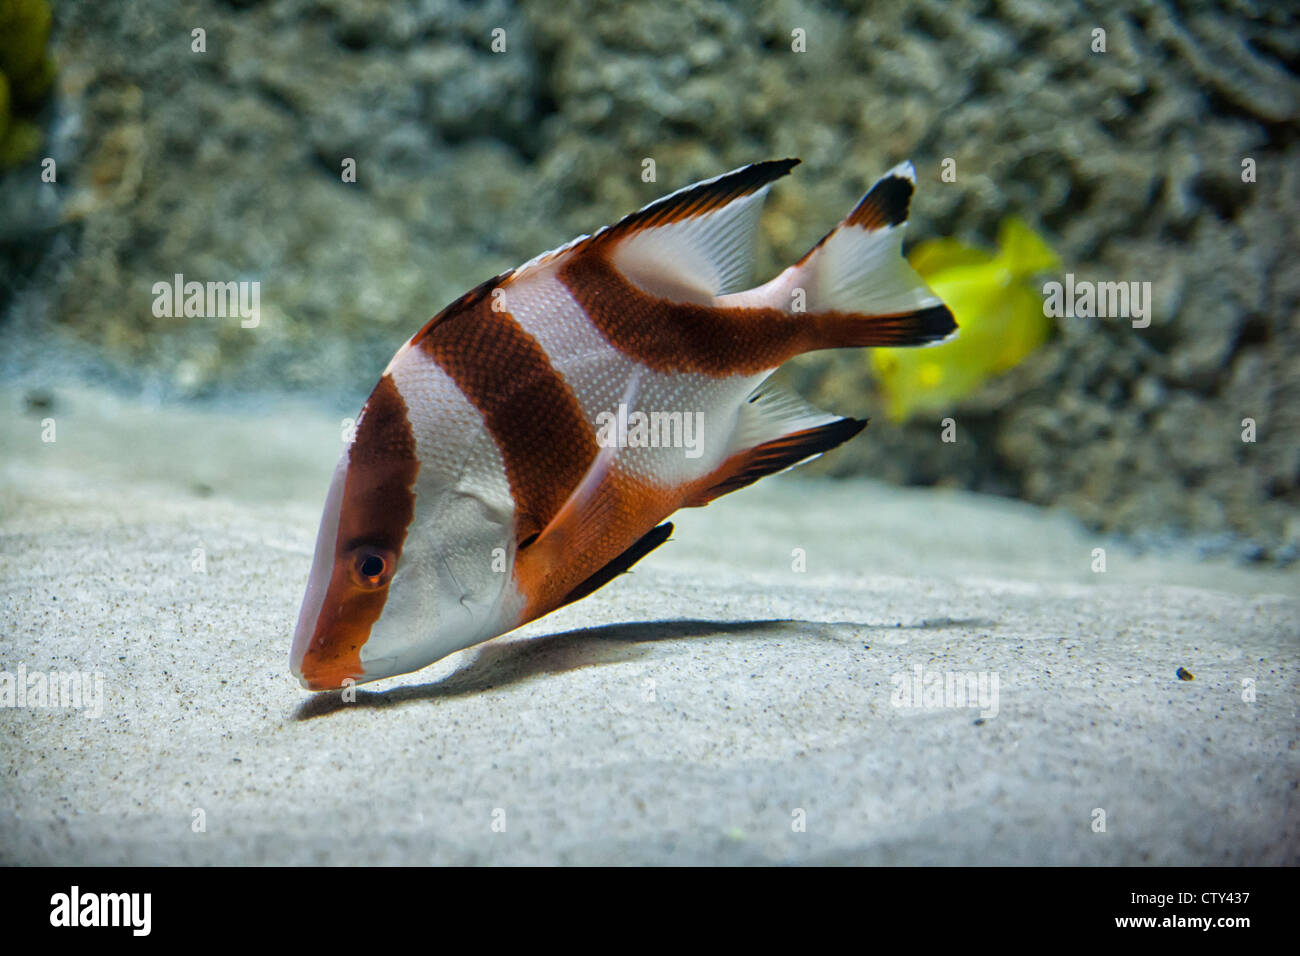 Sea Life Kansas City Aquarium - Stock Image